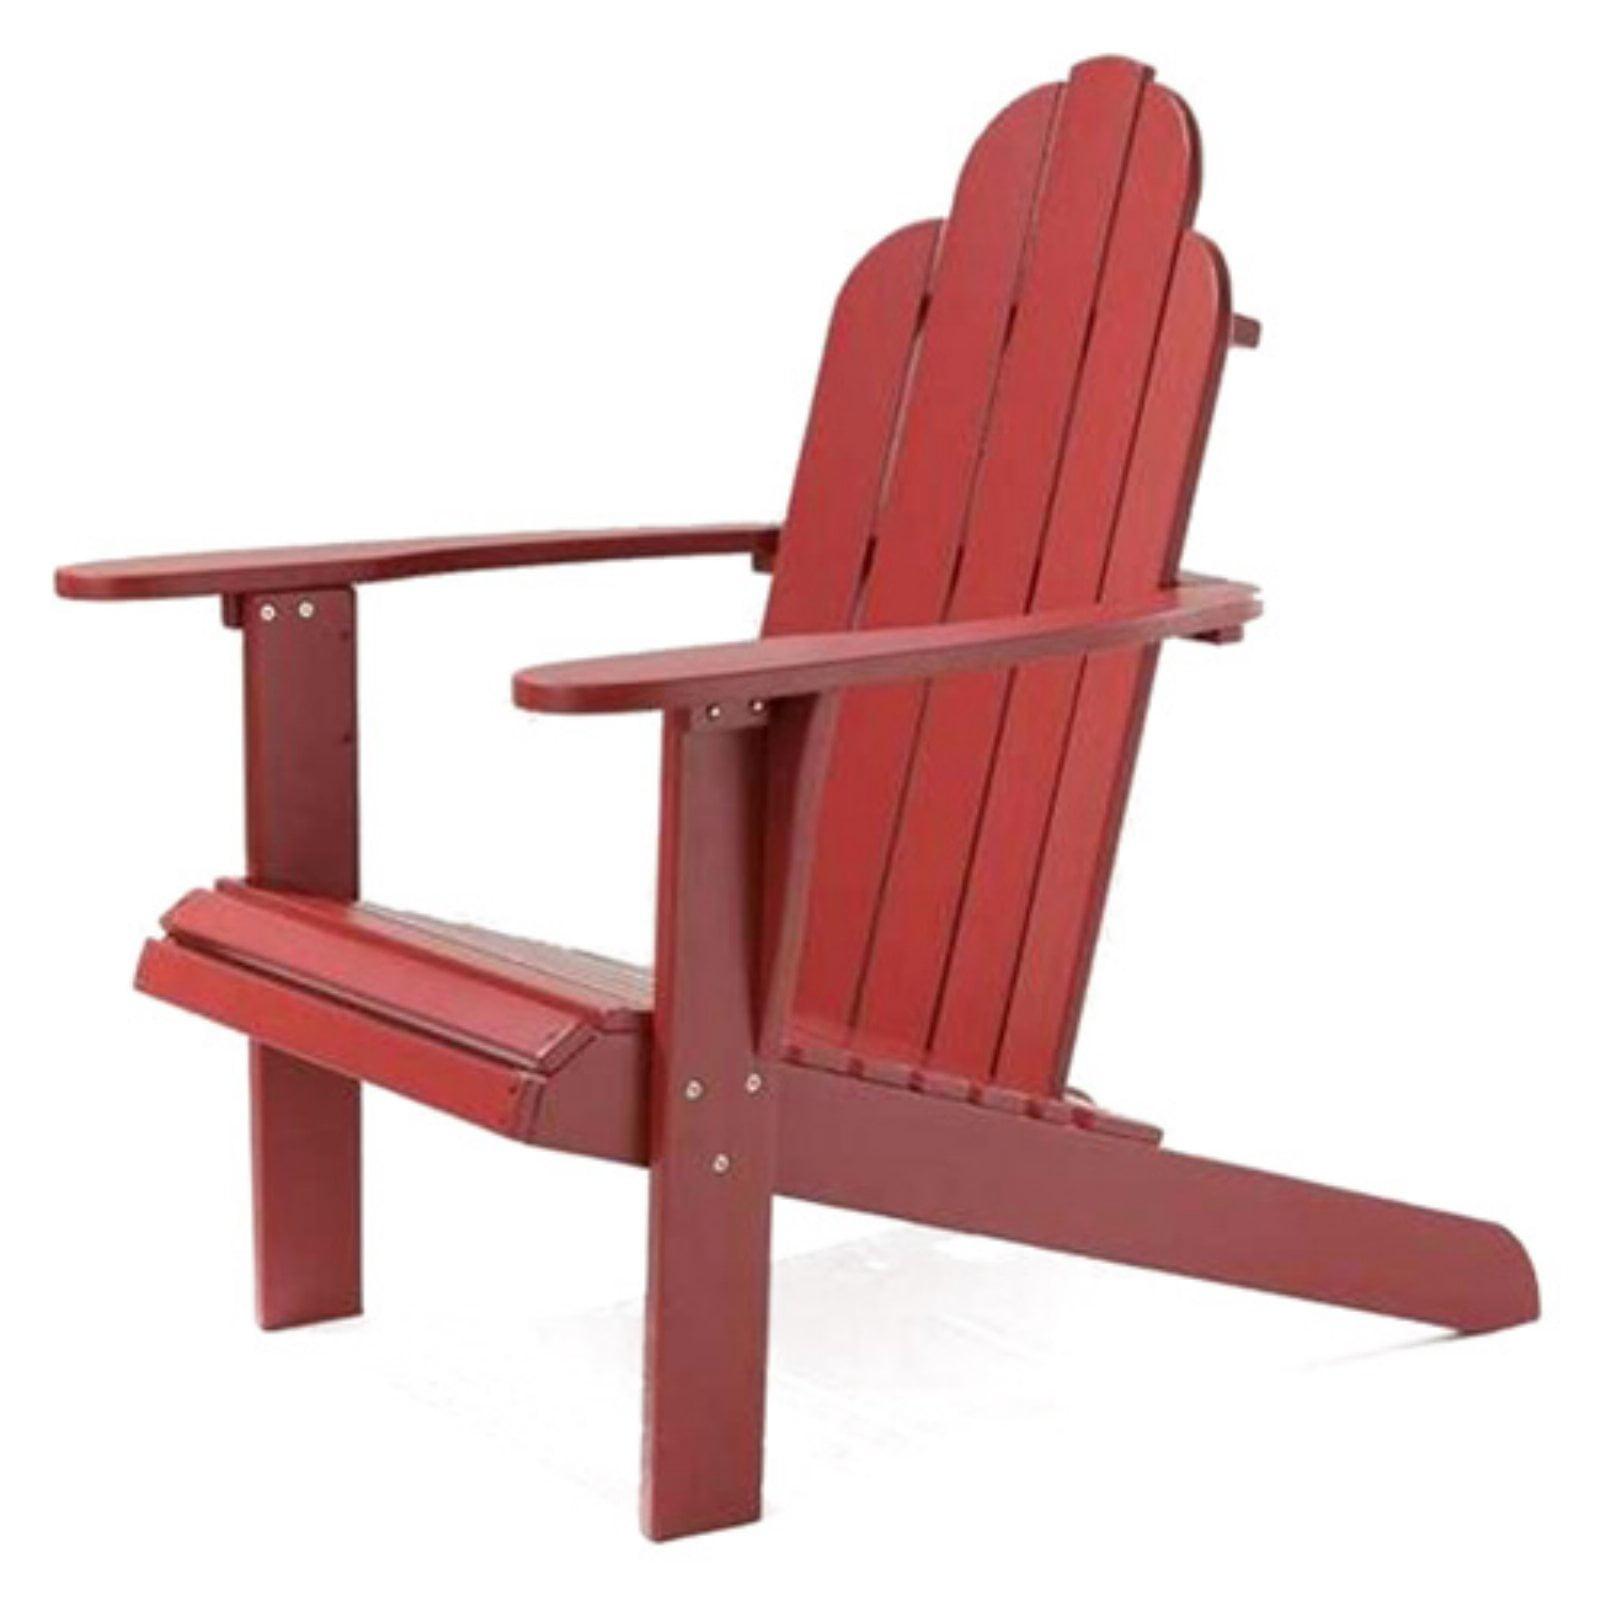 Linon Adirondack Chair, Multiple Colors